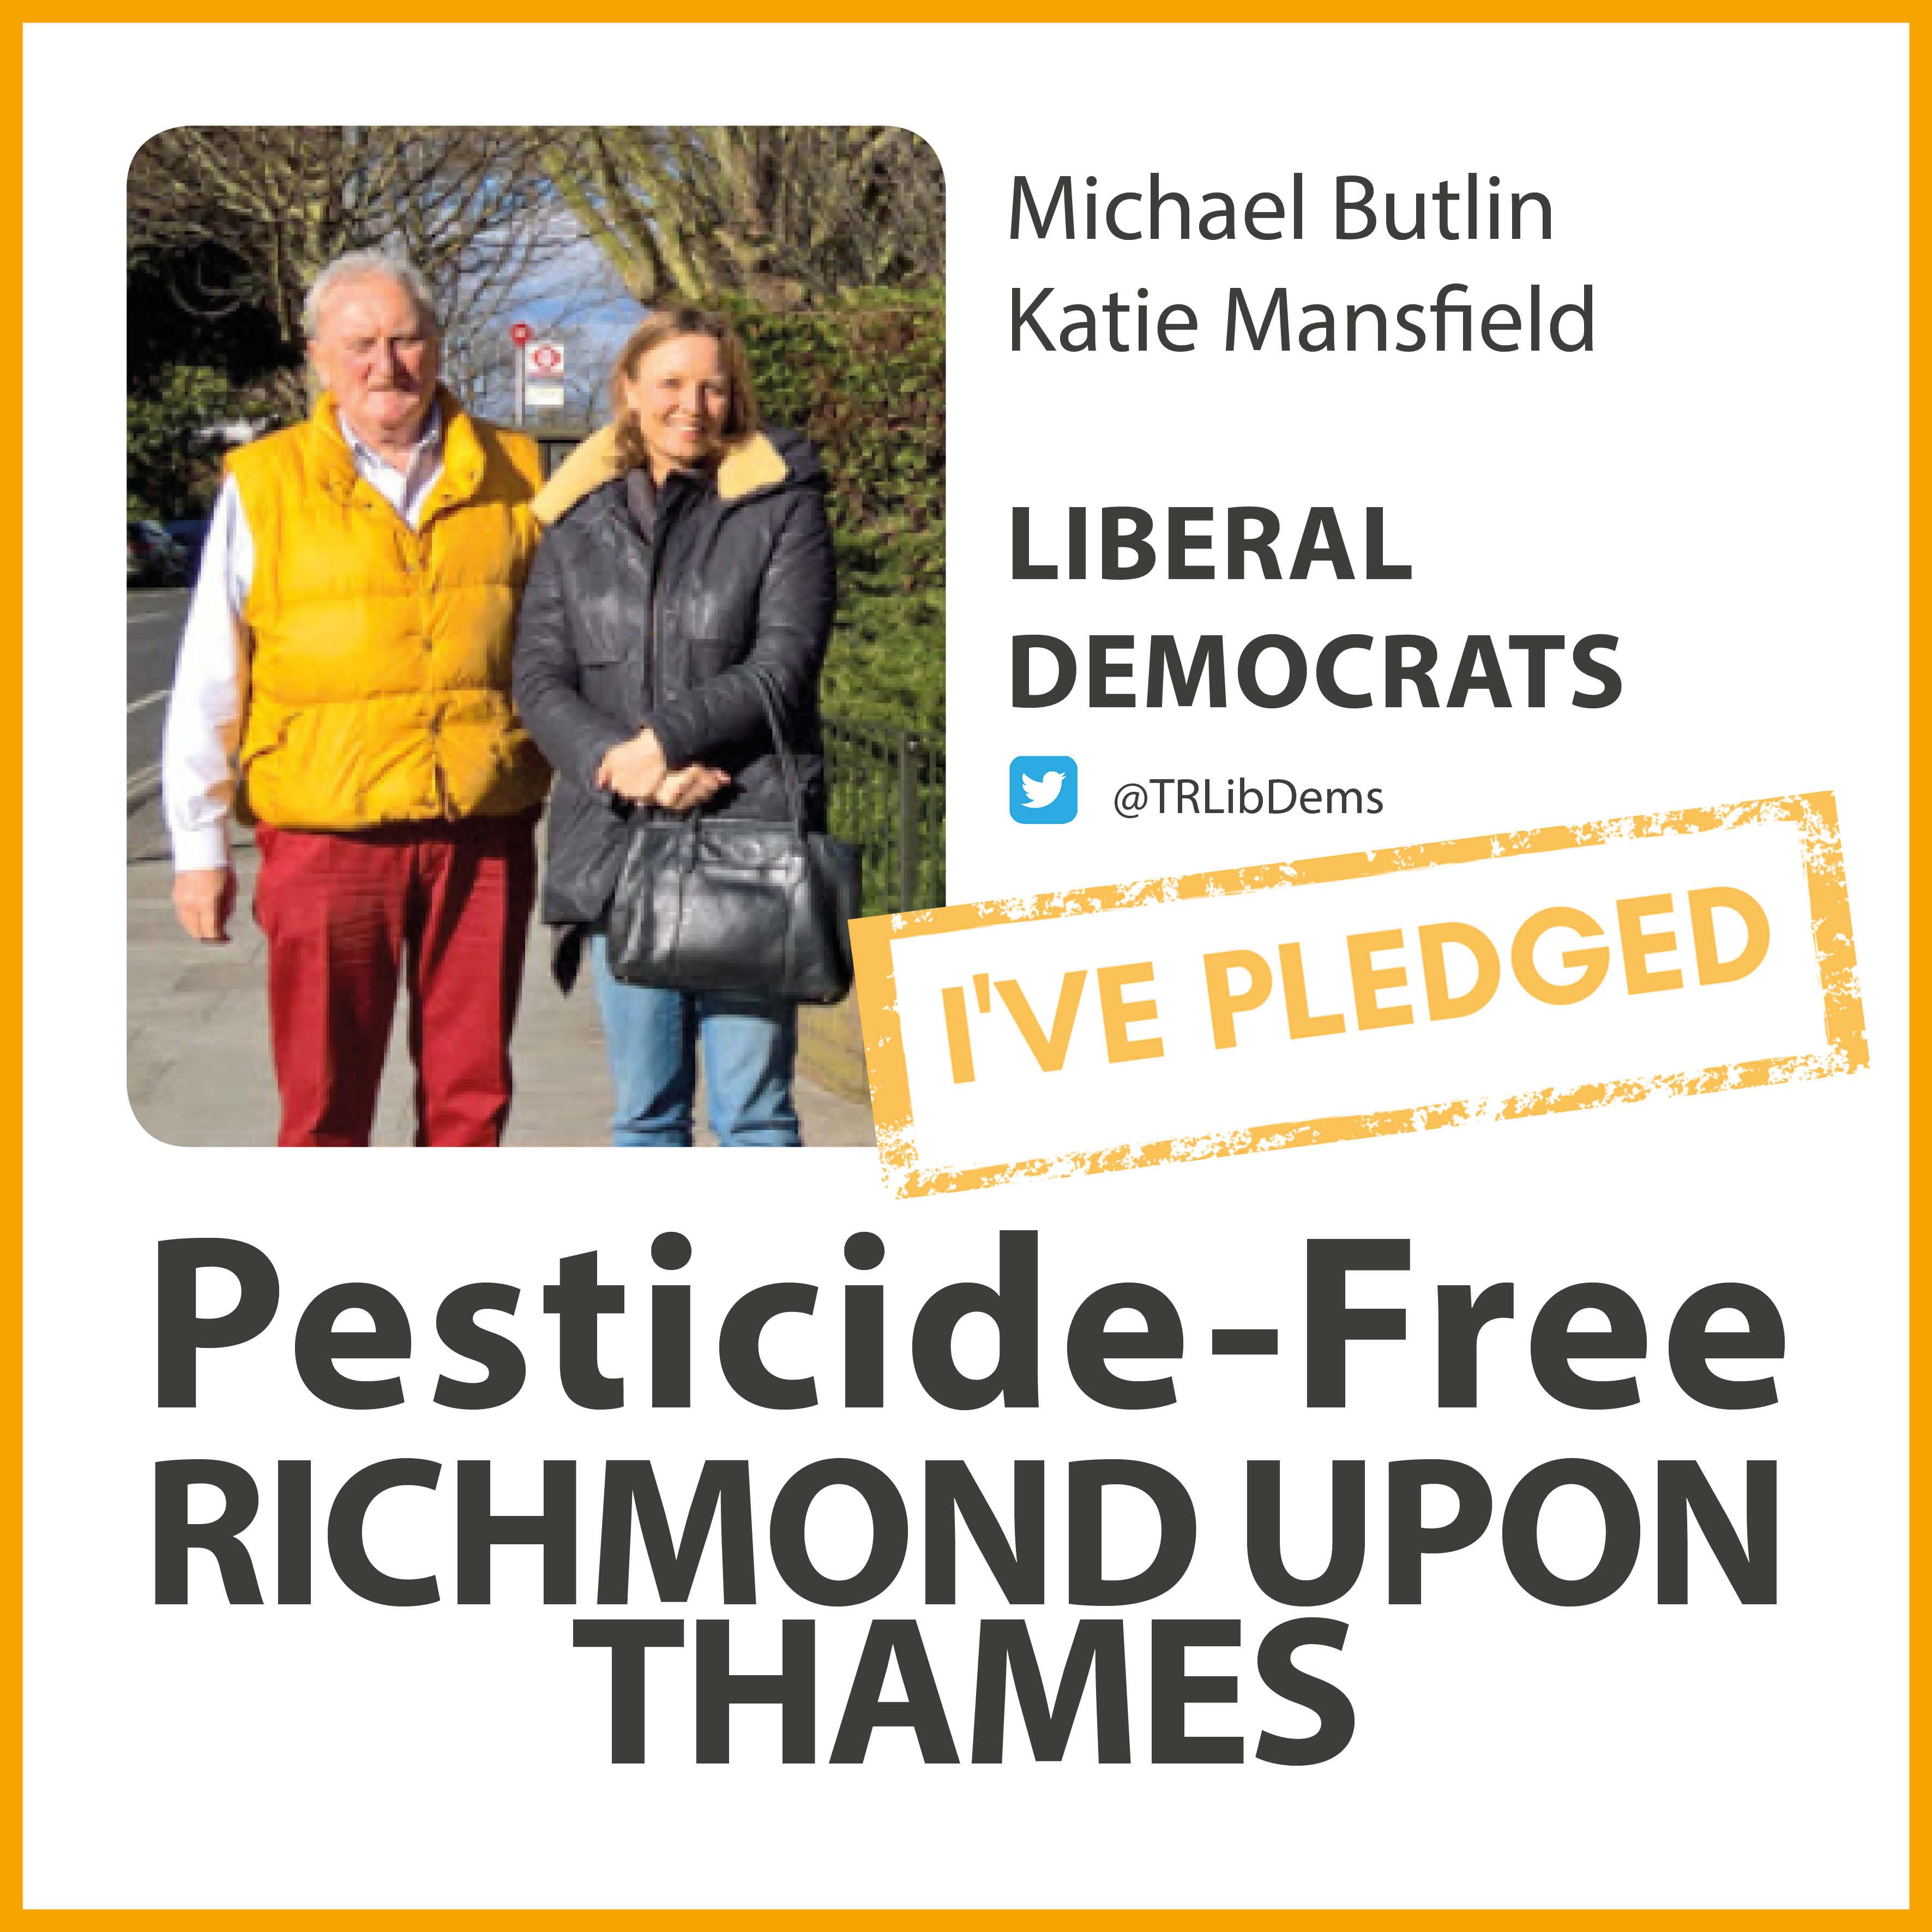 South Twickenham Lib Dems have taken the pesticide-free pledge